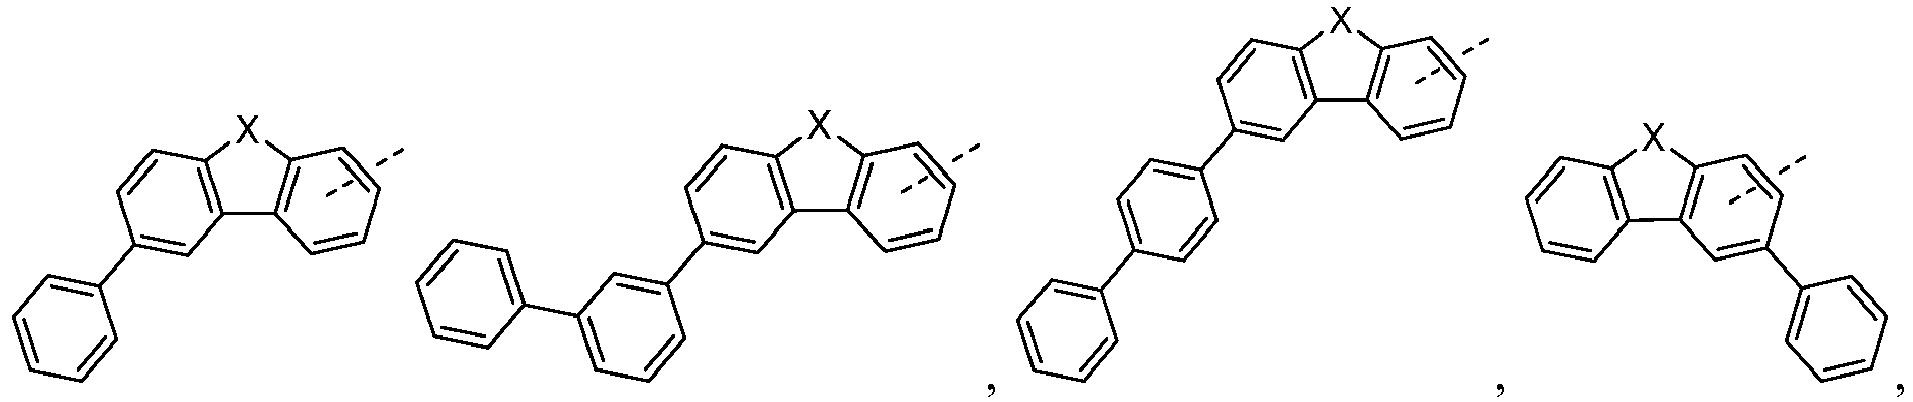 Figure imgb0458